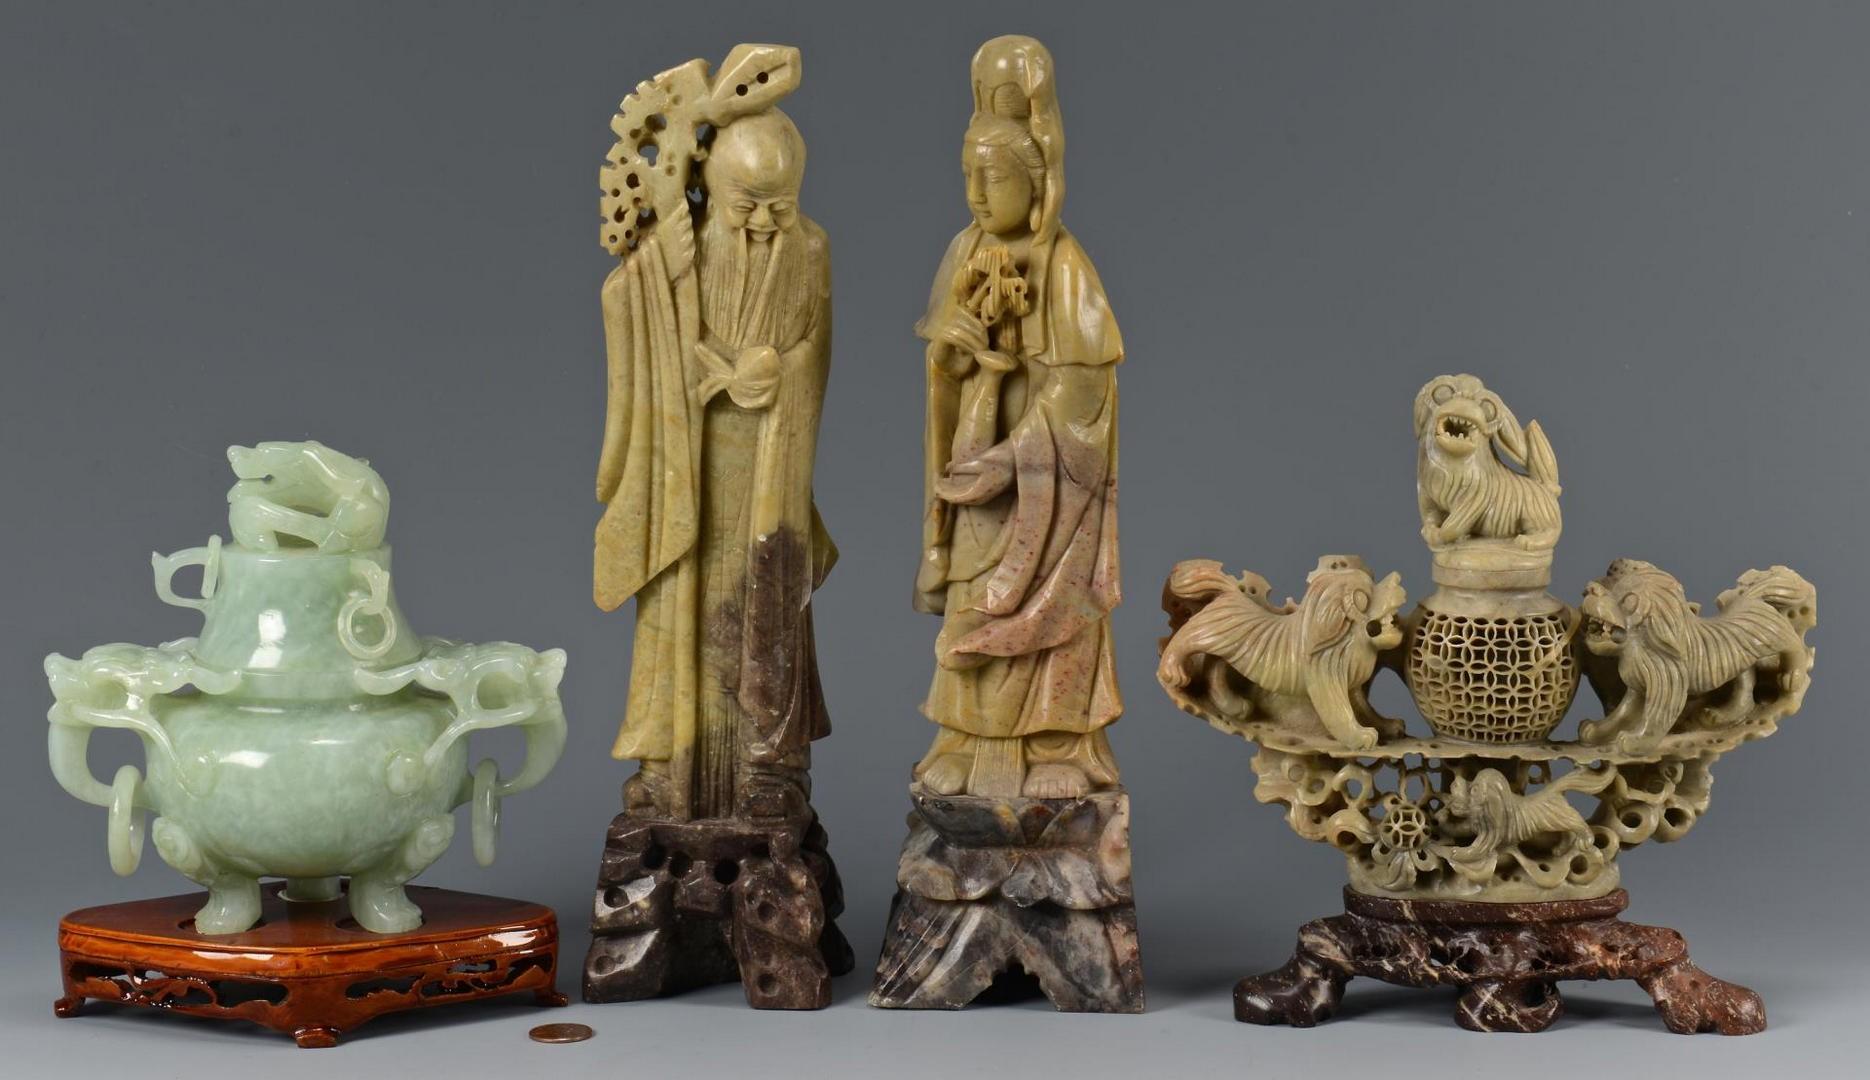 Lot 4010213: Pr Chinese Soapstone Lohan Figures, Jar, Censer